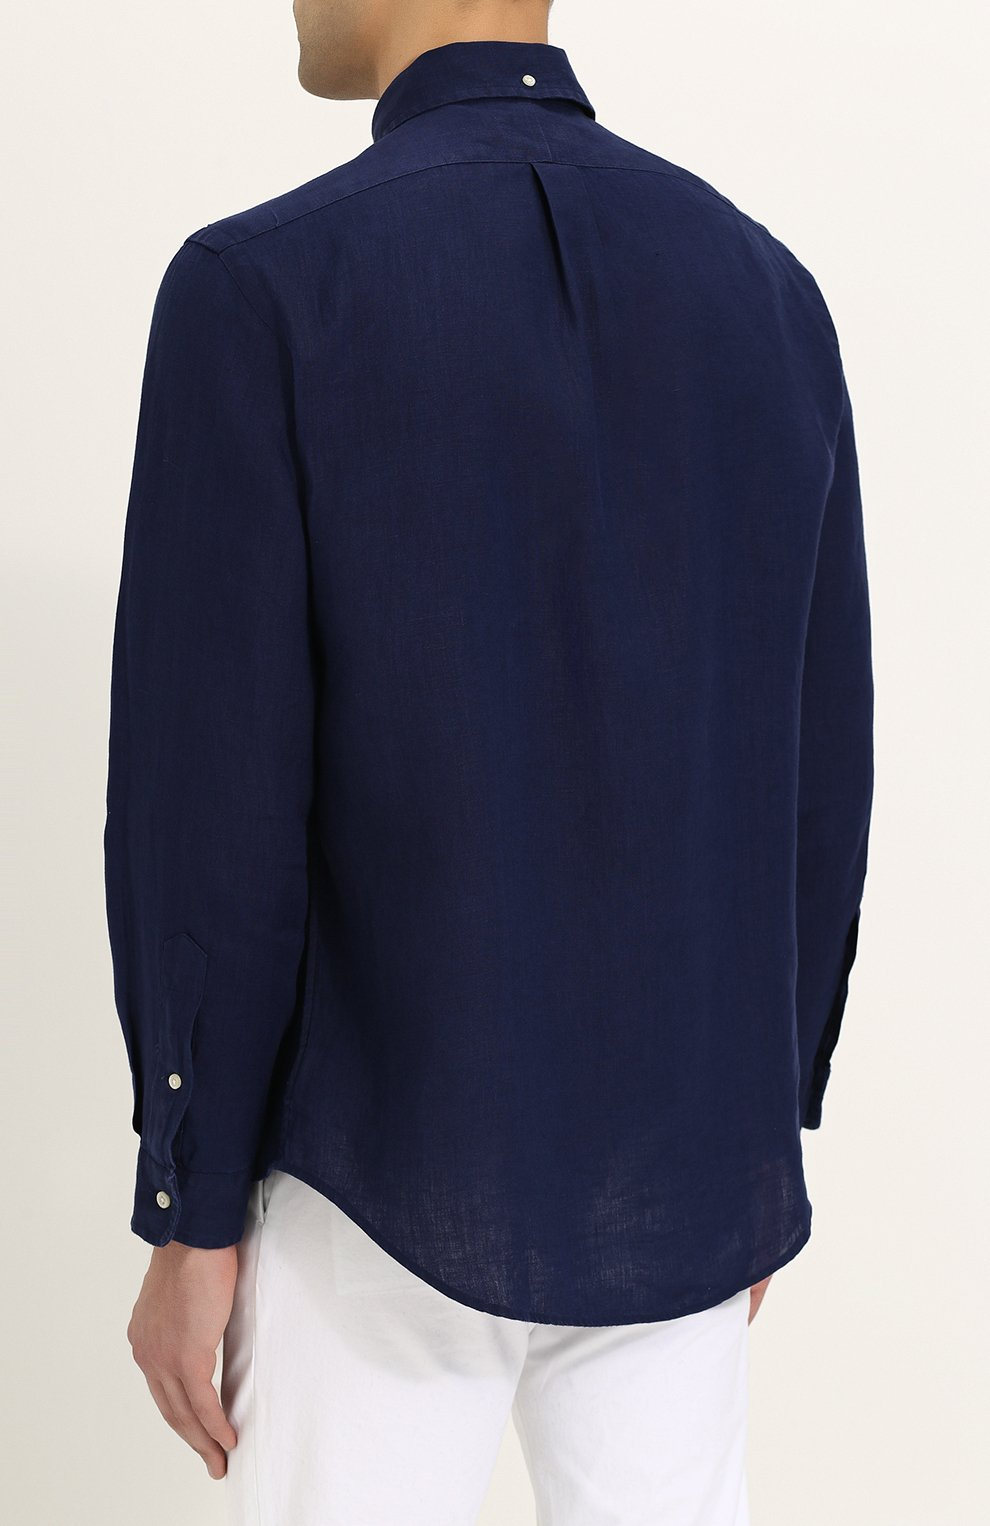 d2271f320ce Льняная рубашка с воротником button down Polo Ralph Lauren темно-синяя